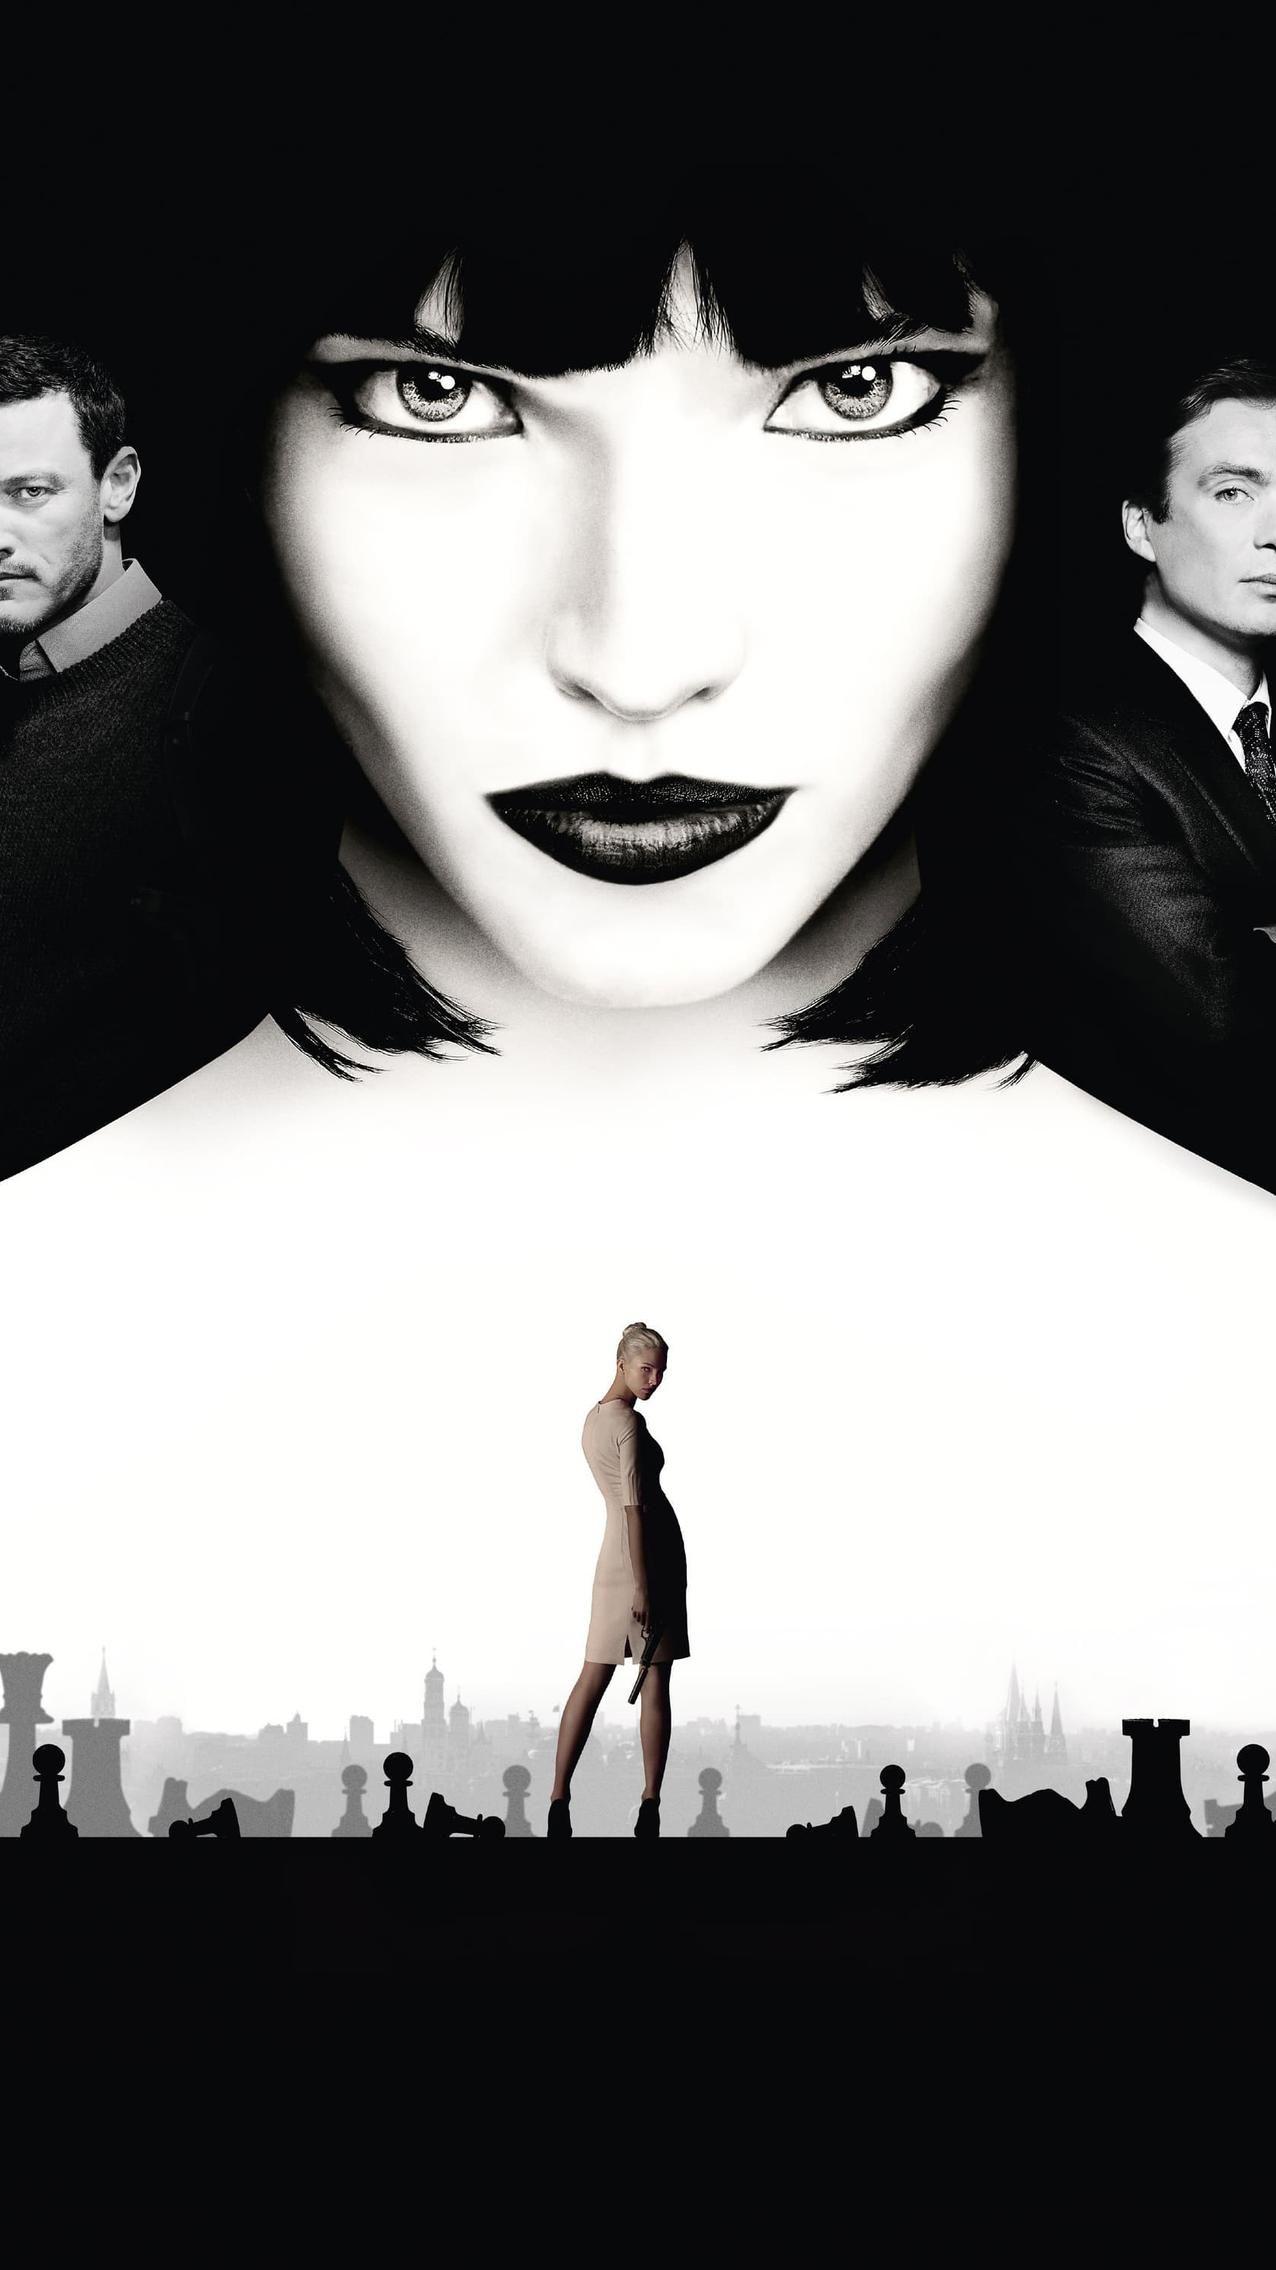 Anna 2019 Phone Wallpaper Moviemania Full Movies Anna Movie Full Movies Online Free